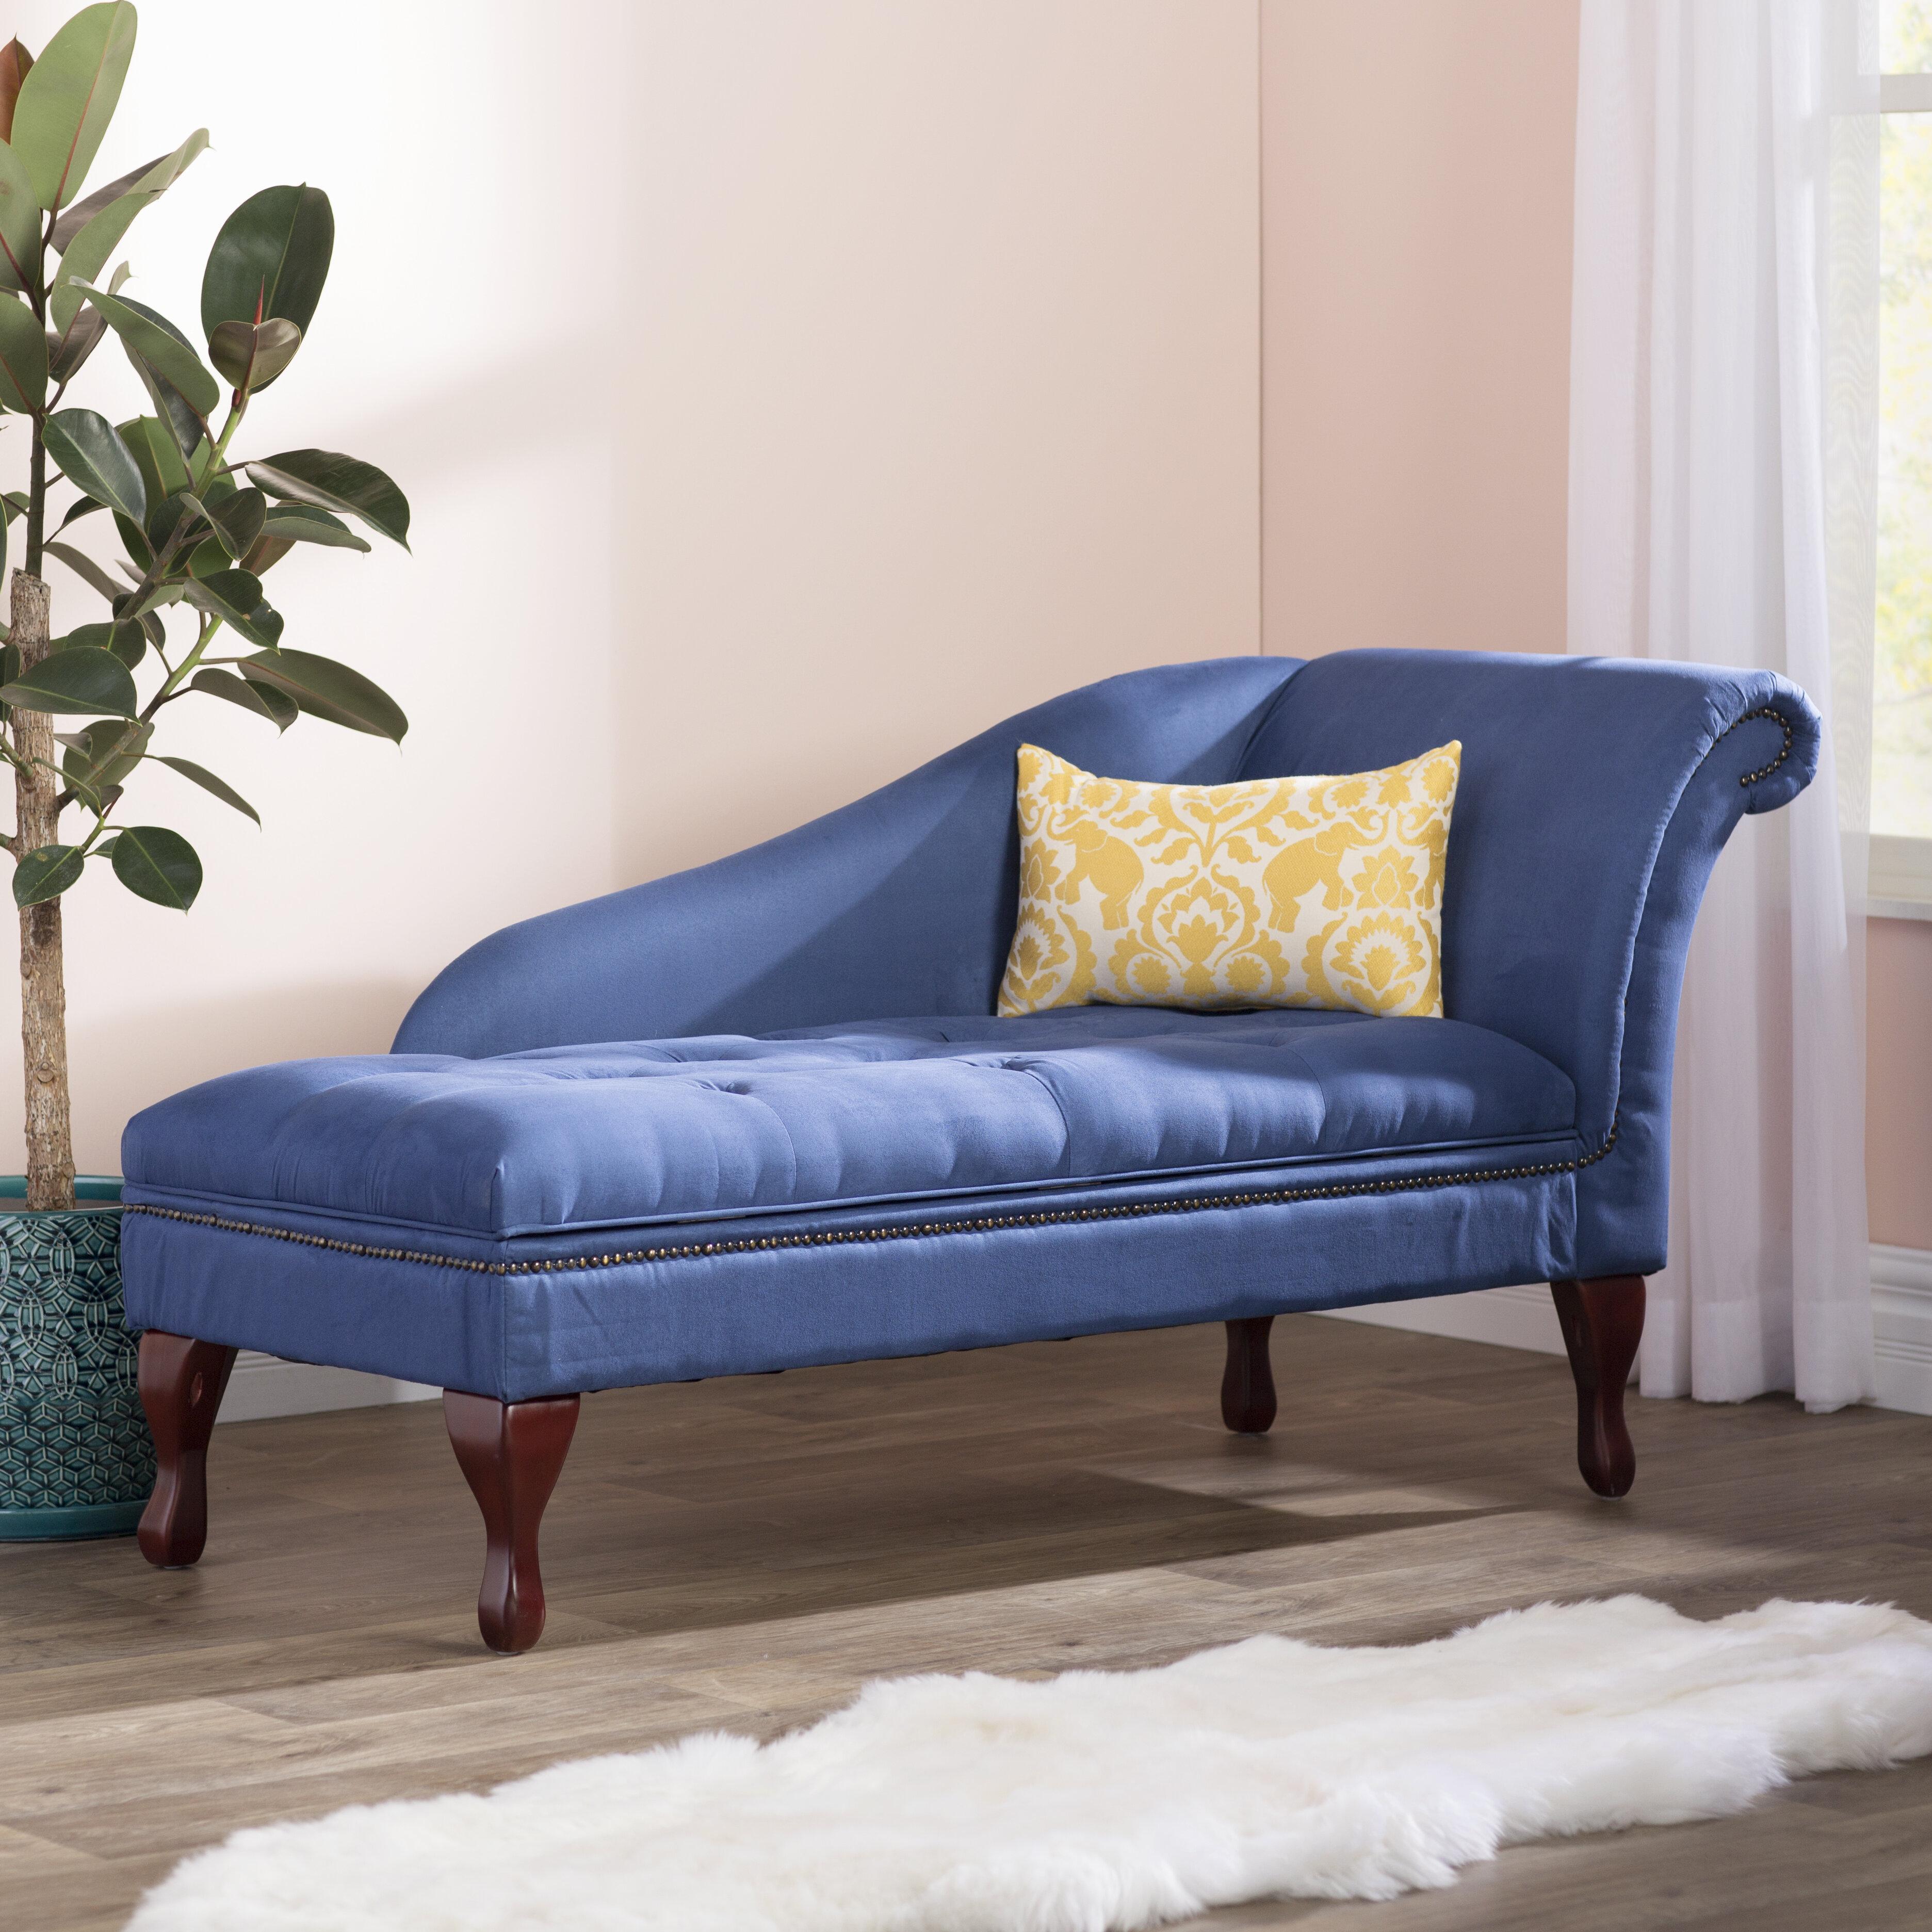 Merveilleux Willa Arlo Interiors Boydston Storage Chaise Lounge U0026 Reviews | Wayfair